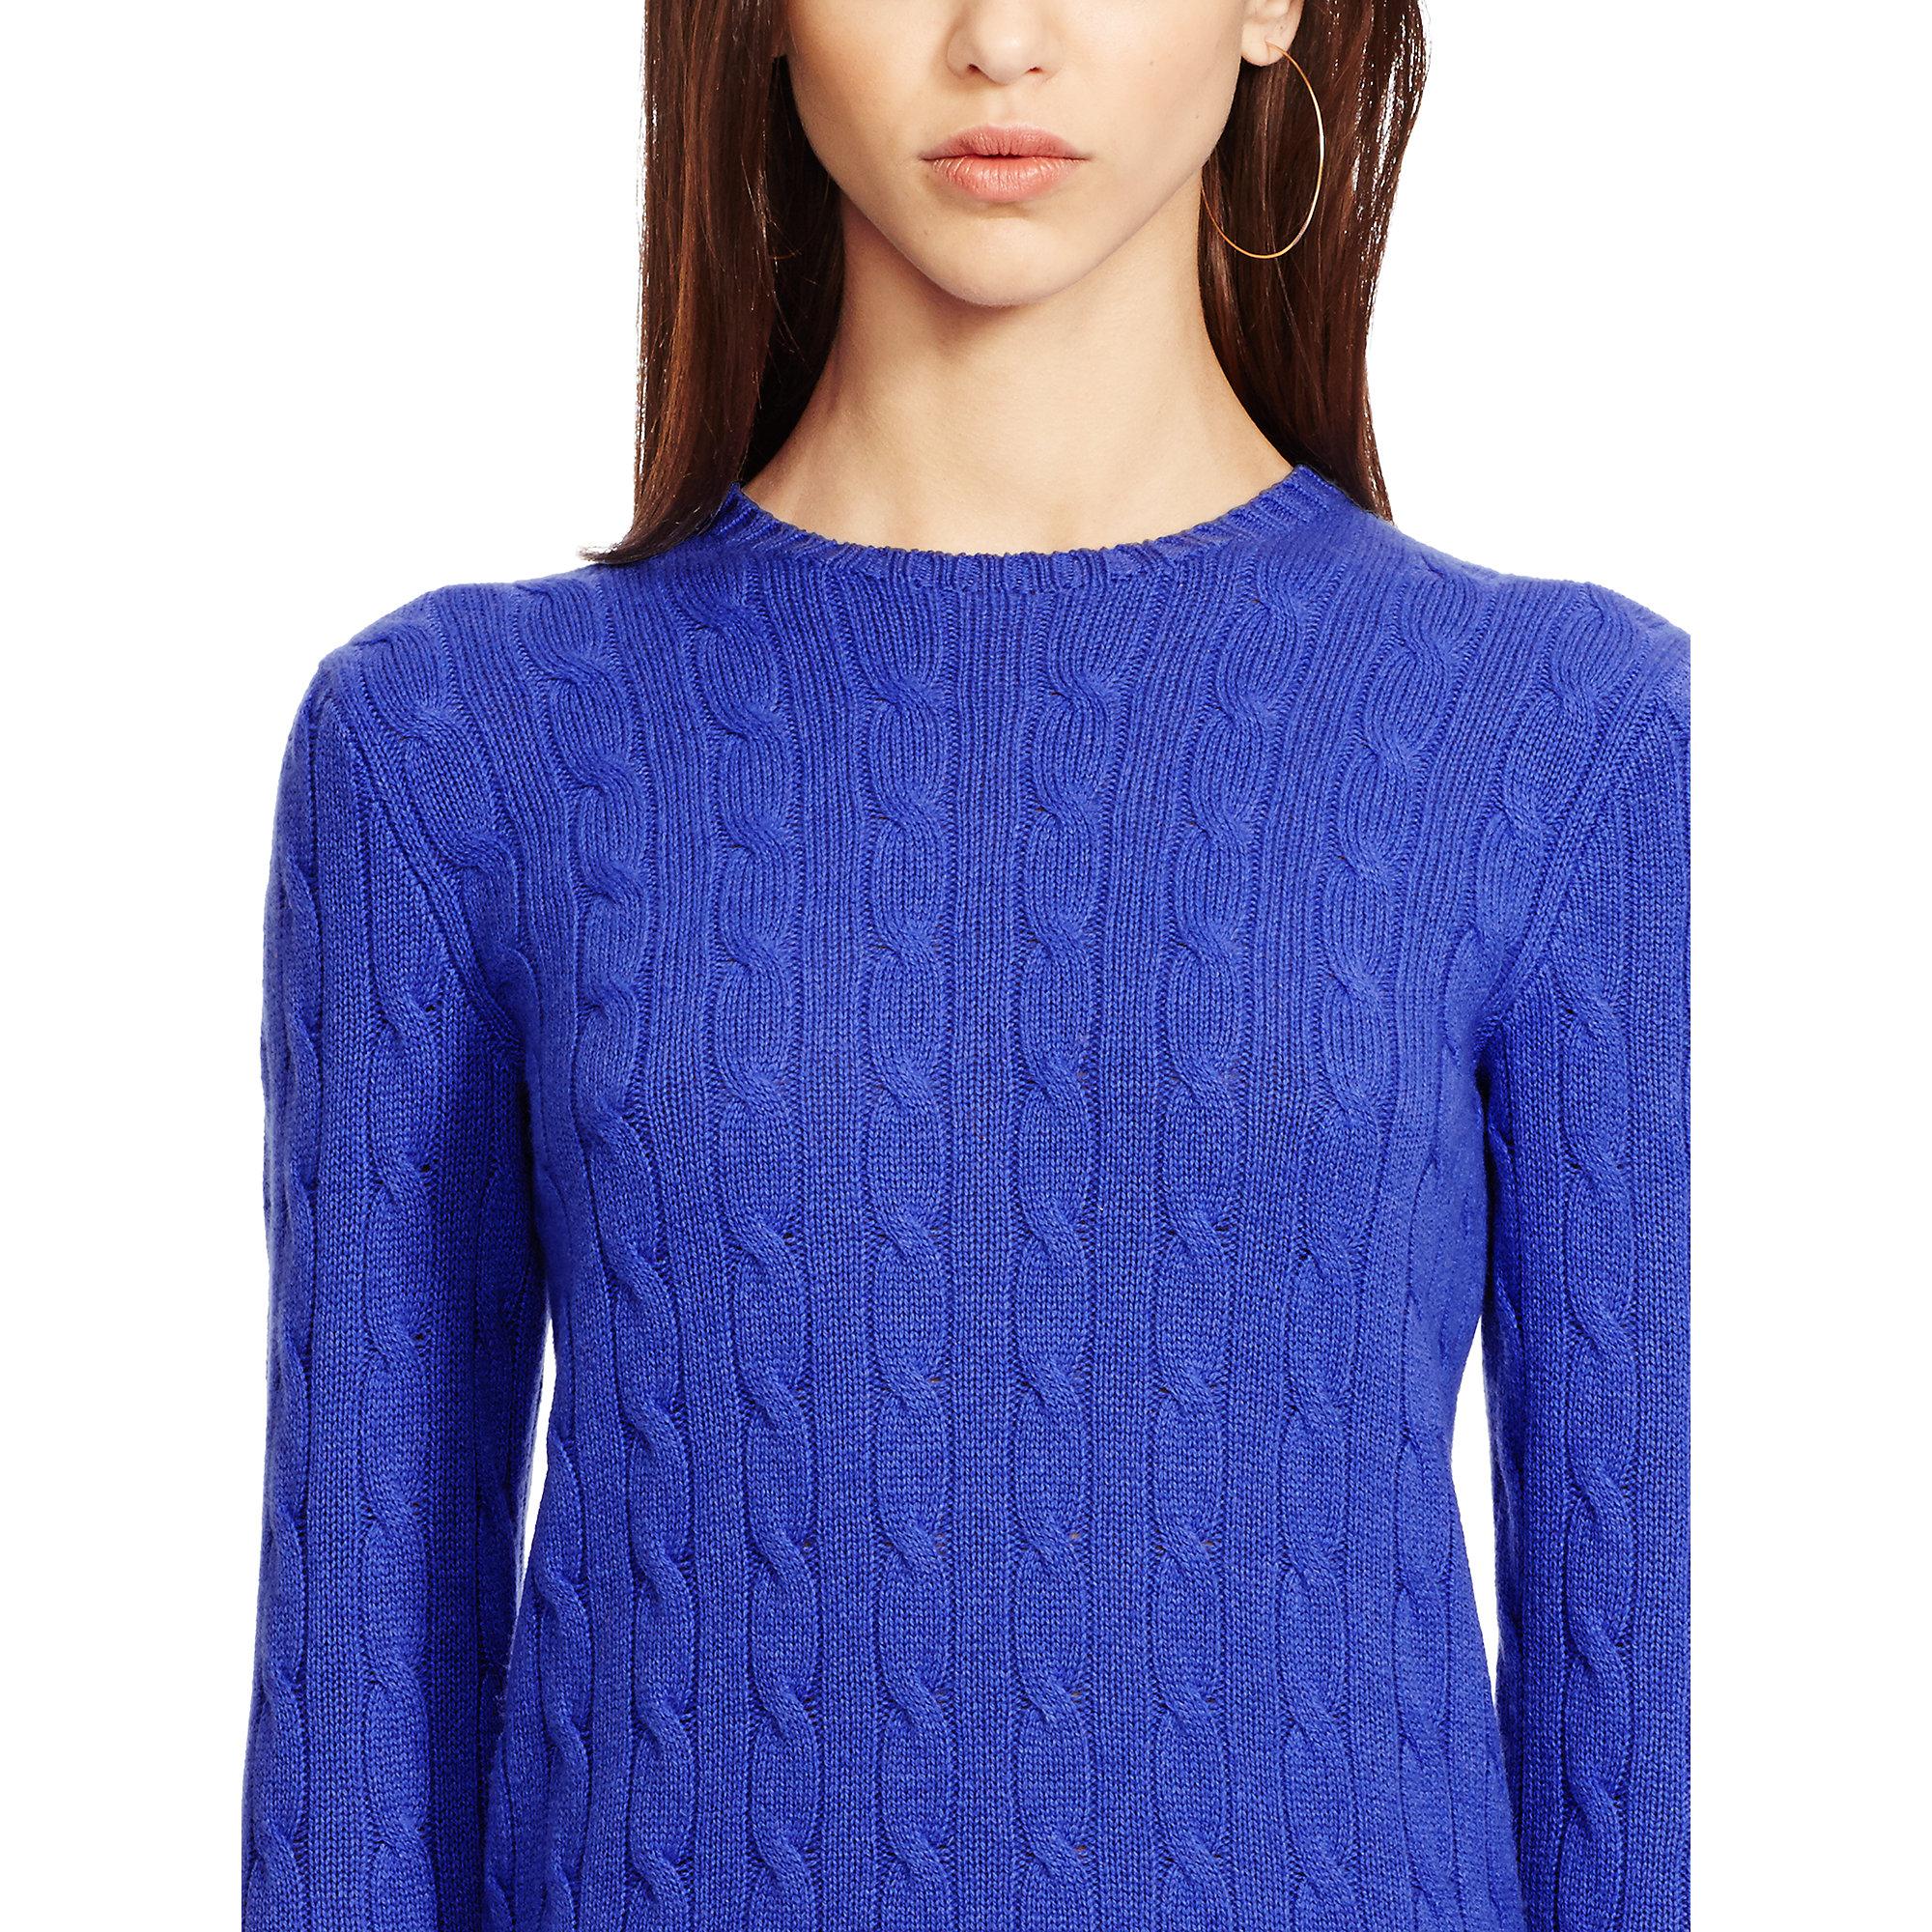 polo ralph lauren slim fit cabled cashmere in blue deep. Black Bedroom Furniture Sets. Home Design Ideas